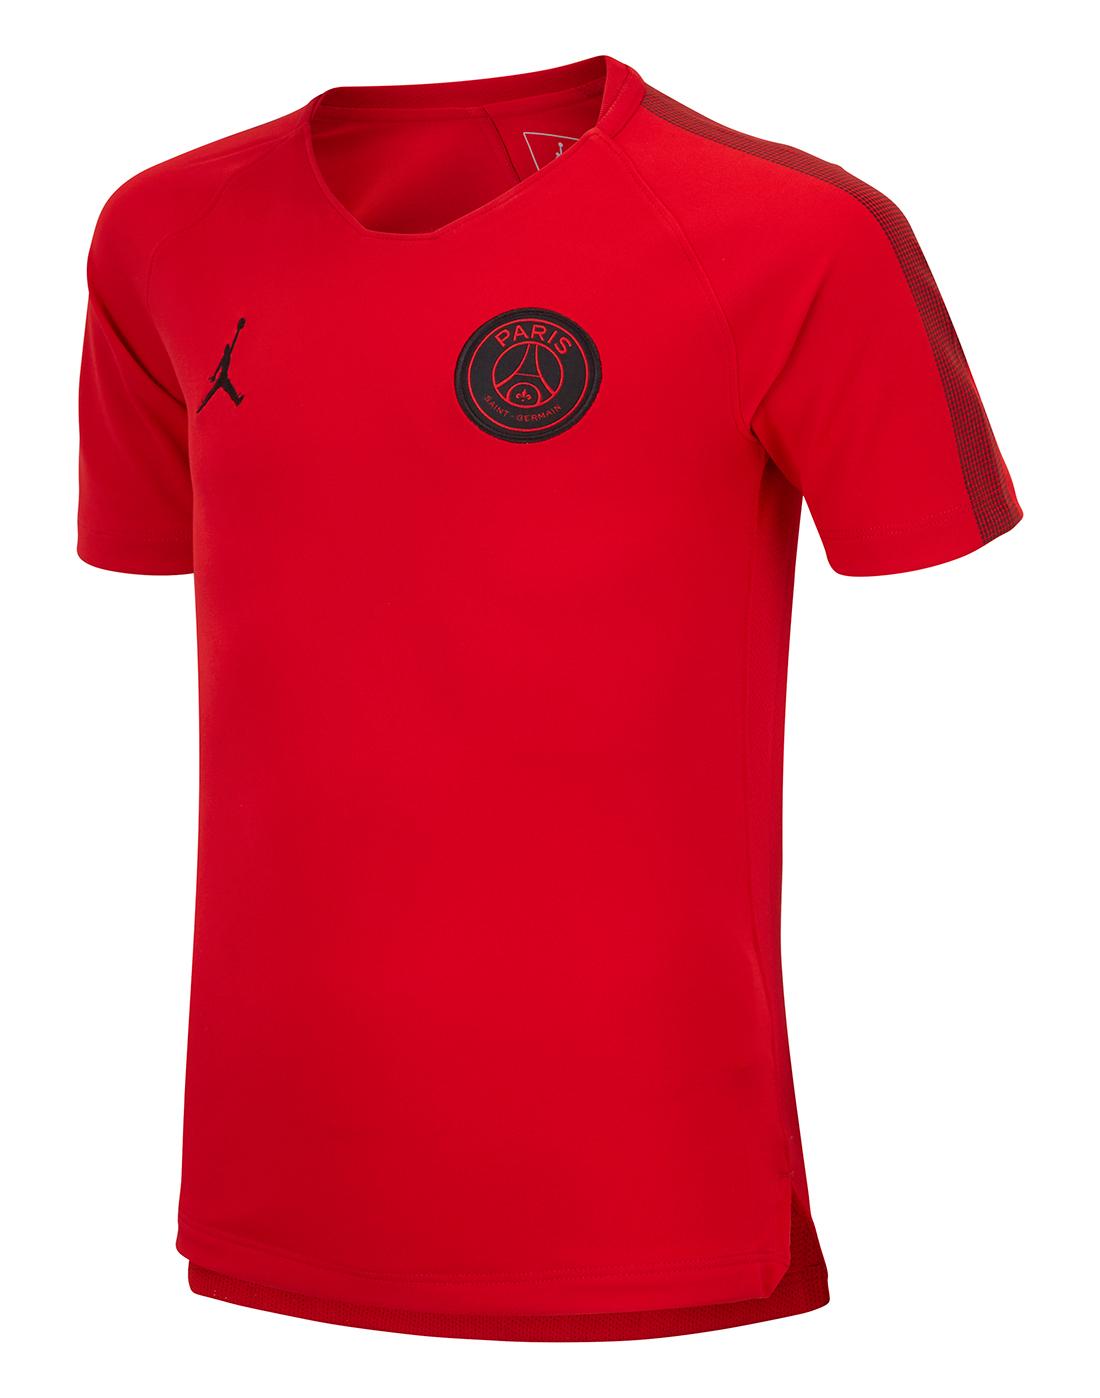 finest selection 2b913 fa876 Nike Kids PSG Jordan Training Jersey   Life Style Sports